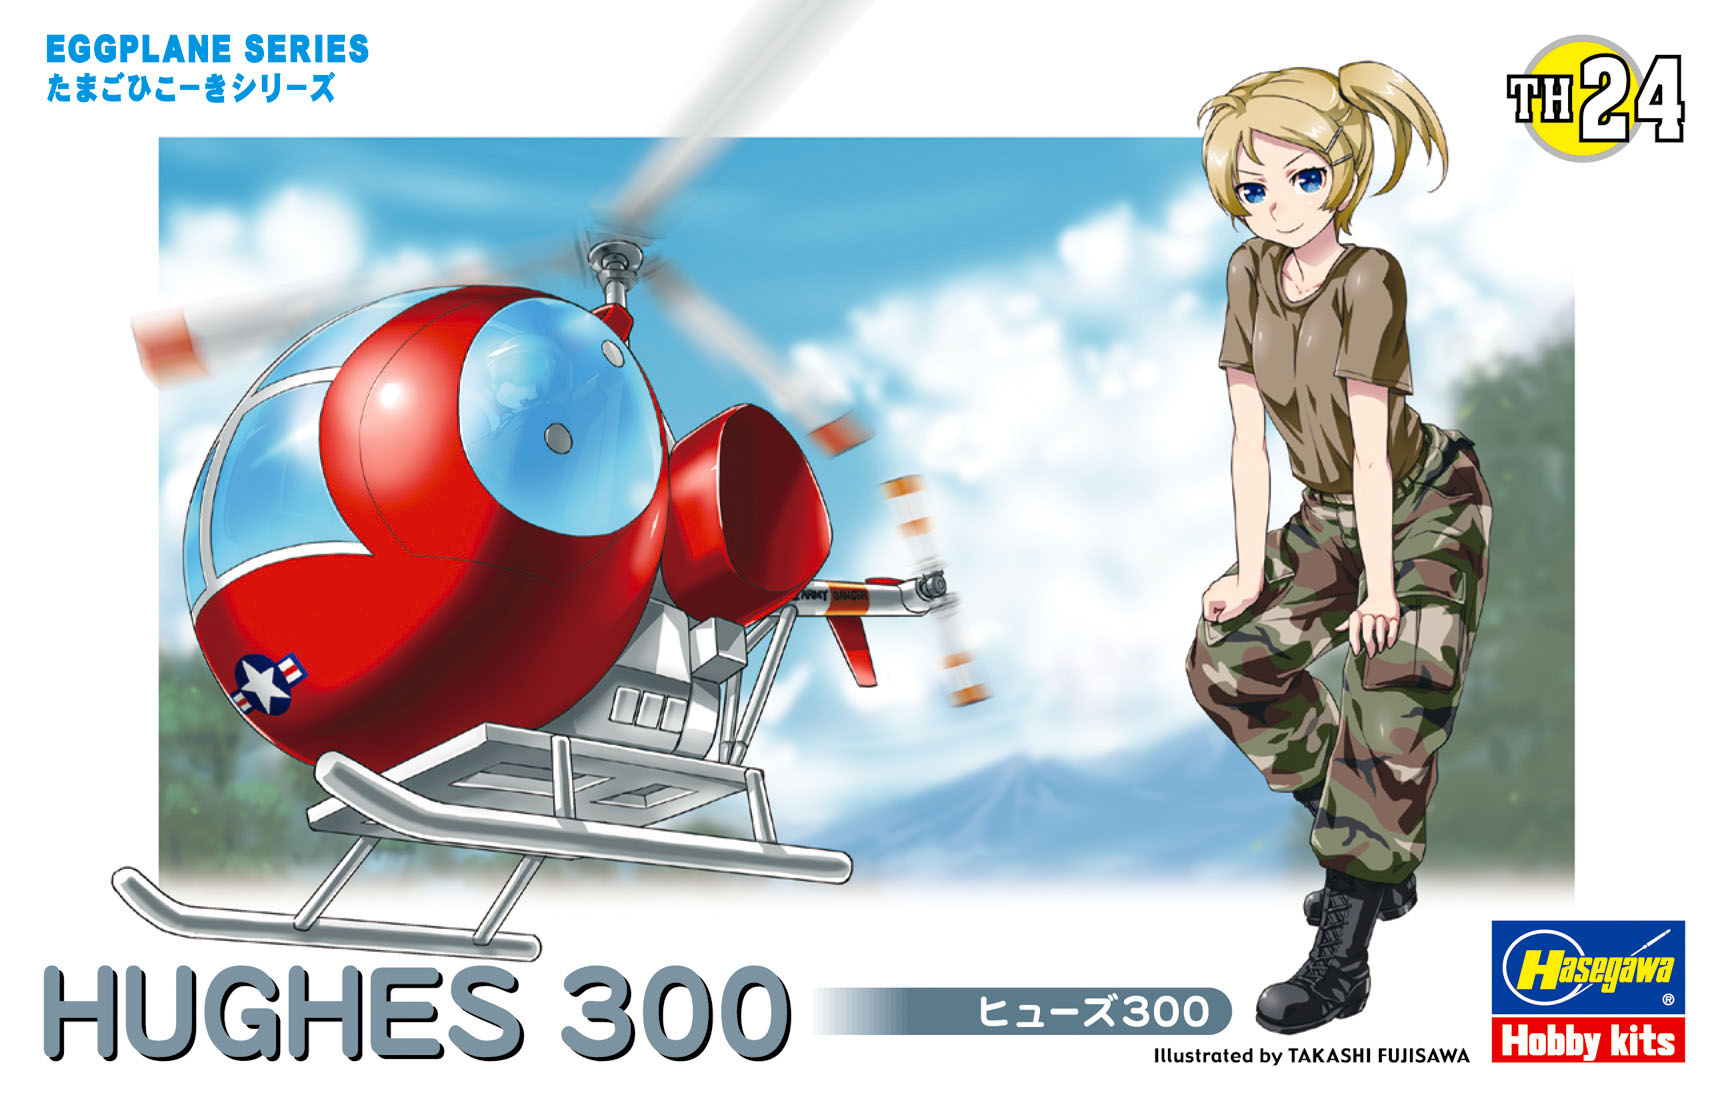 Hasegawa Egg Plane Hughes 300